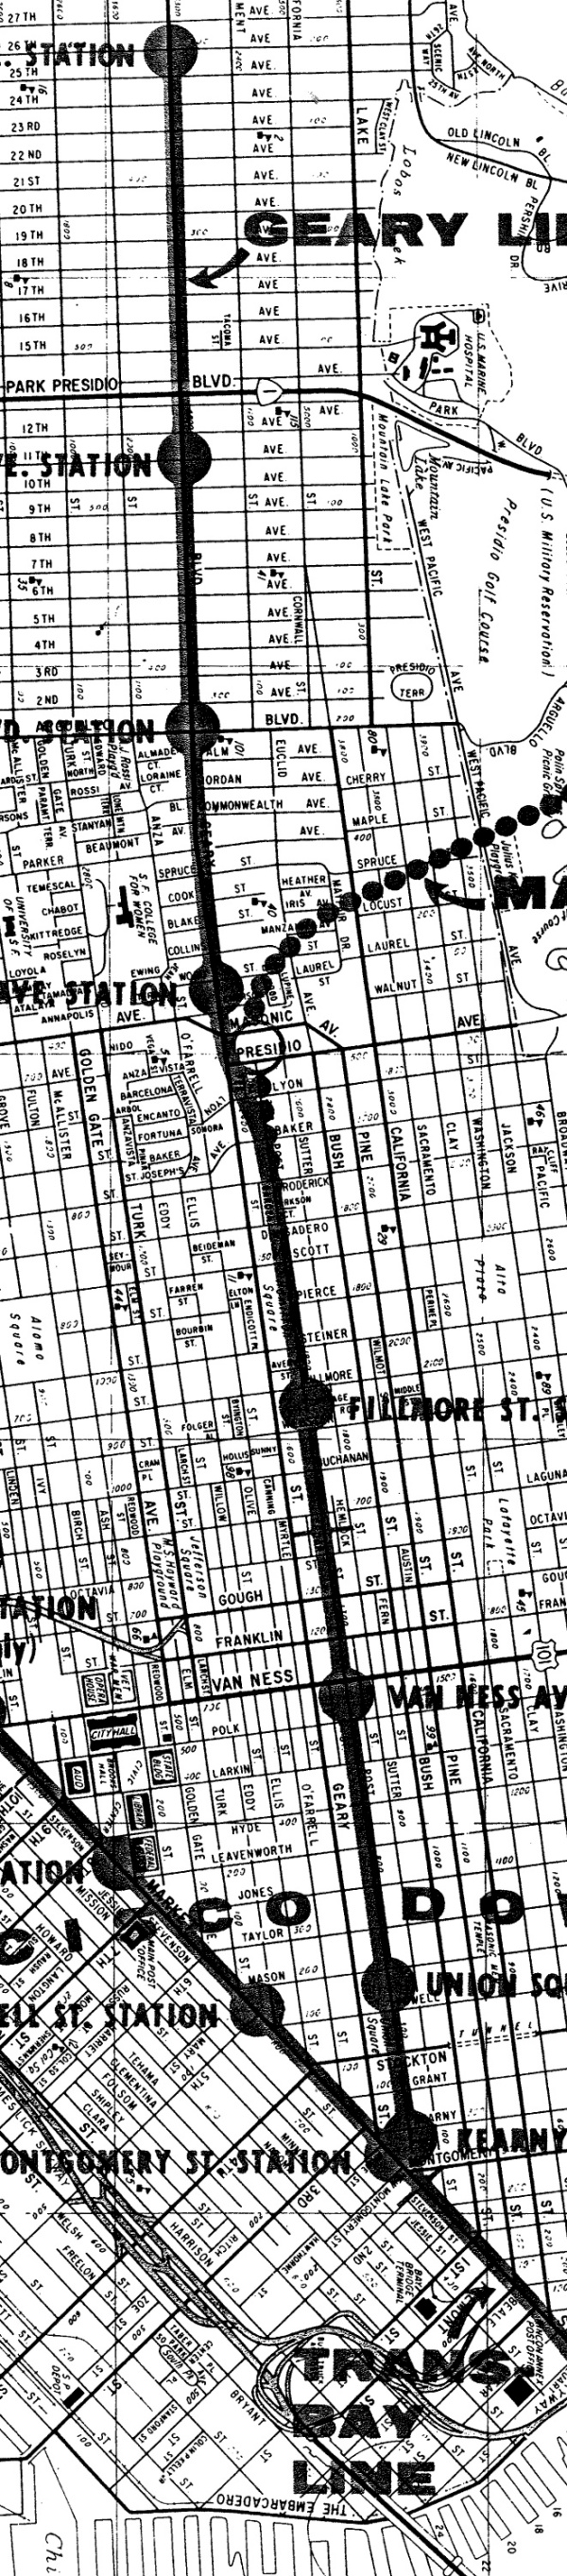 1961 BART Geary St crop